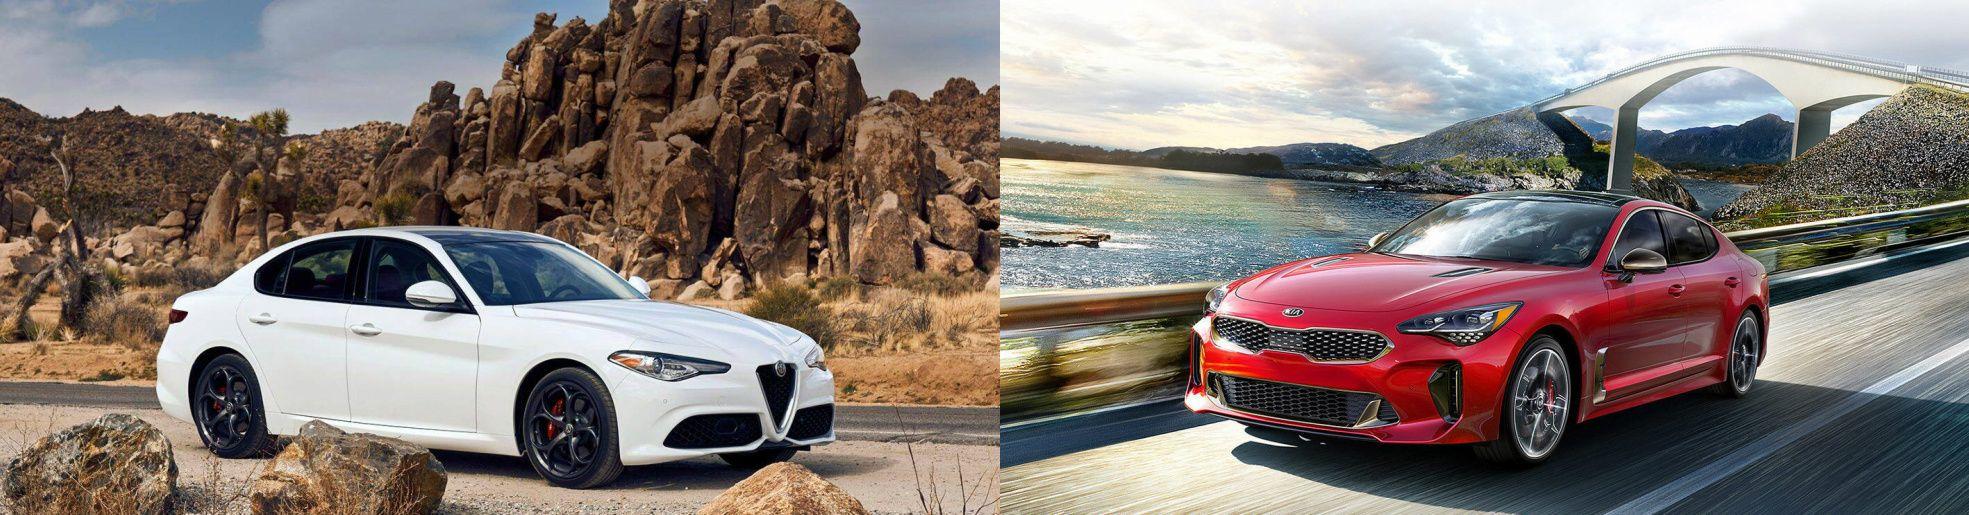 See How The Alfa Romeo Giulia Compares To The Kia Stinger In This Head To Head Look Kia Stinger Alfa Romeo Giulia Kia